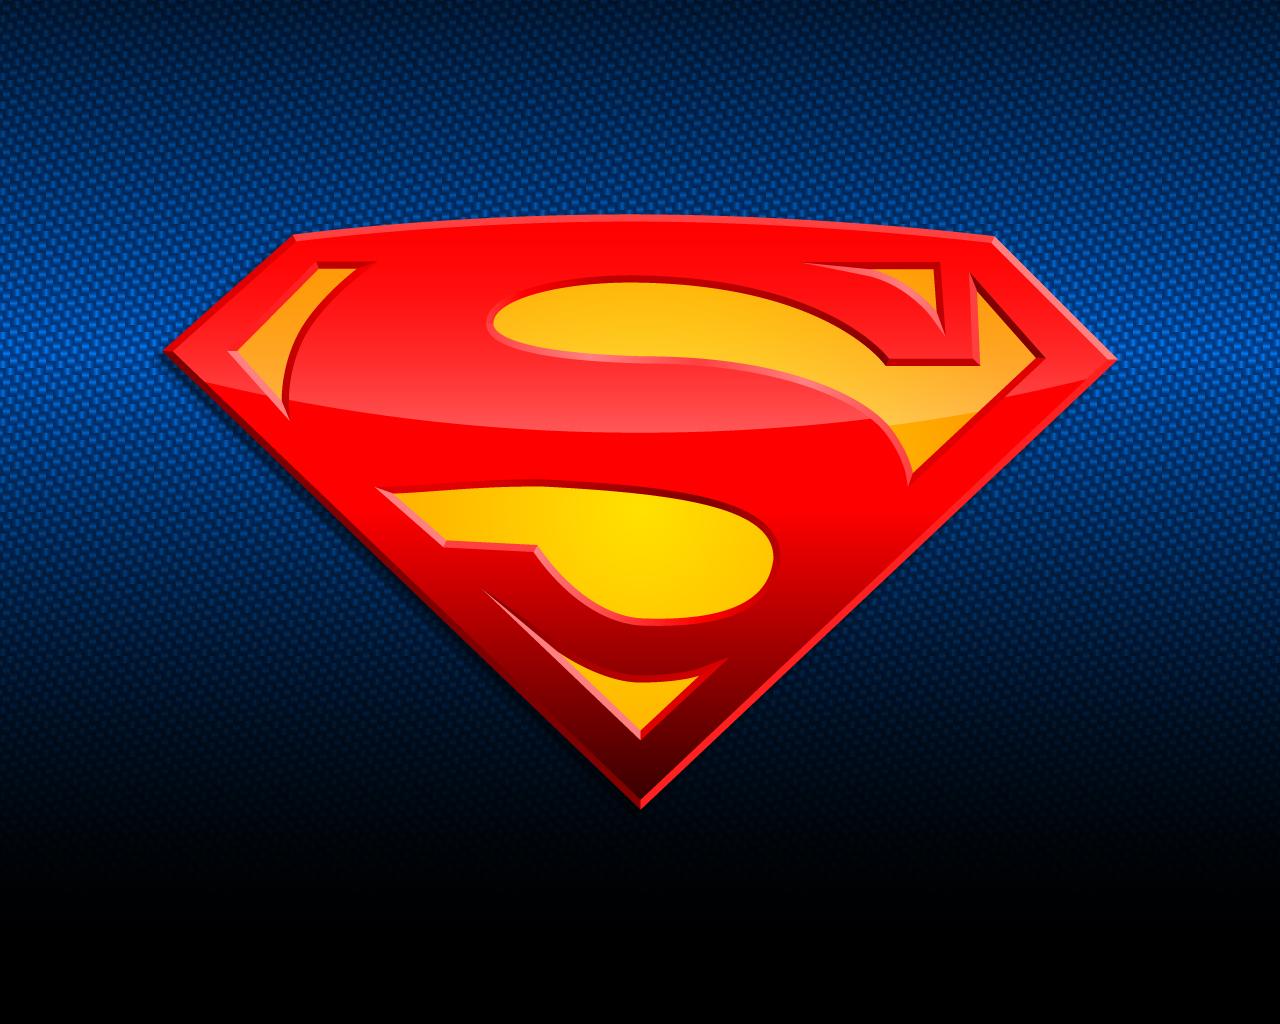 http://2.bp.blogspot.com/-ARTu1Ffqzfg/TdbvLOXUkfI/AAAAAAAAXn8/ciS11_8l6Zs/s1600/Superman+1.jpg